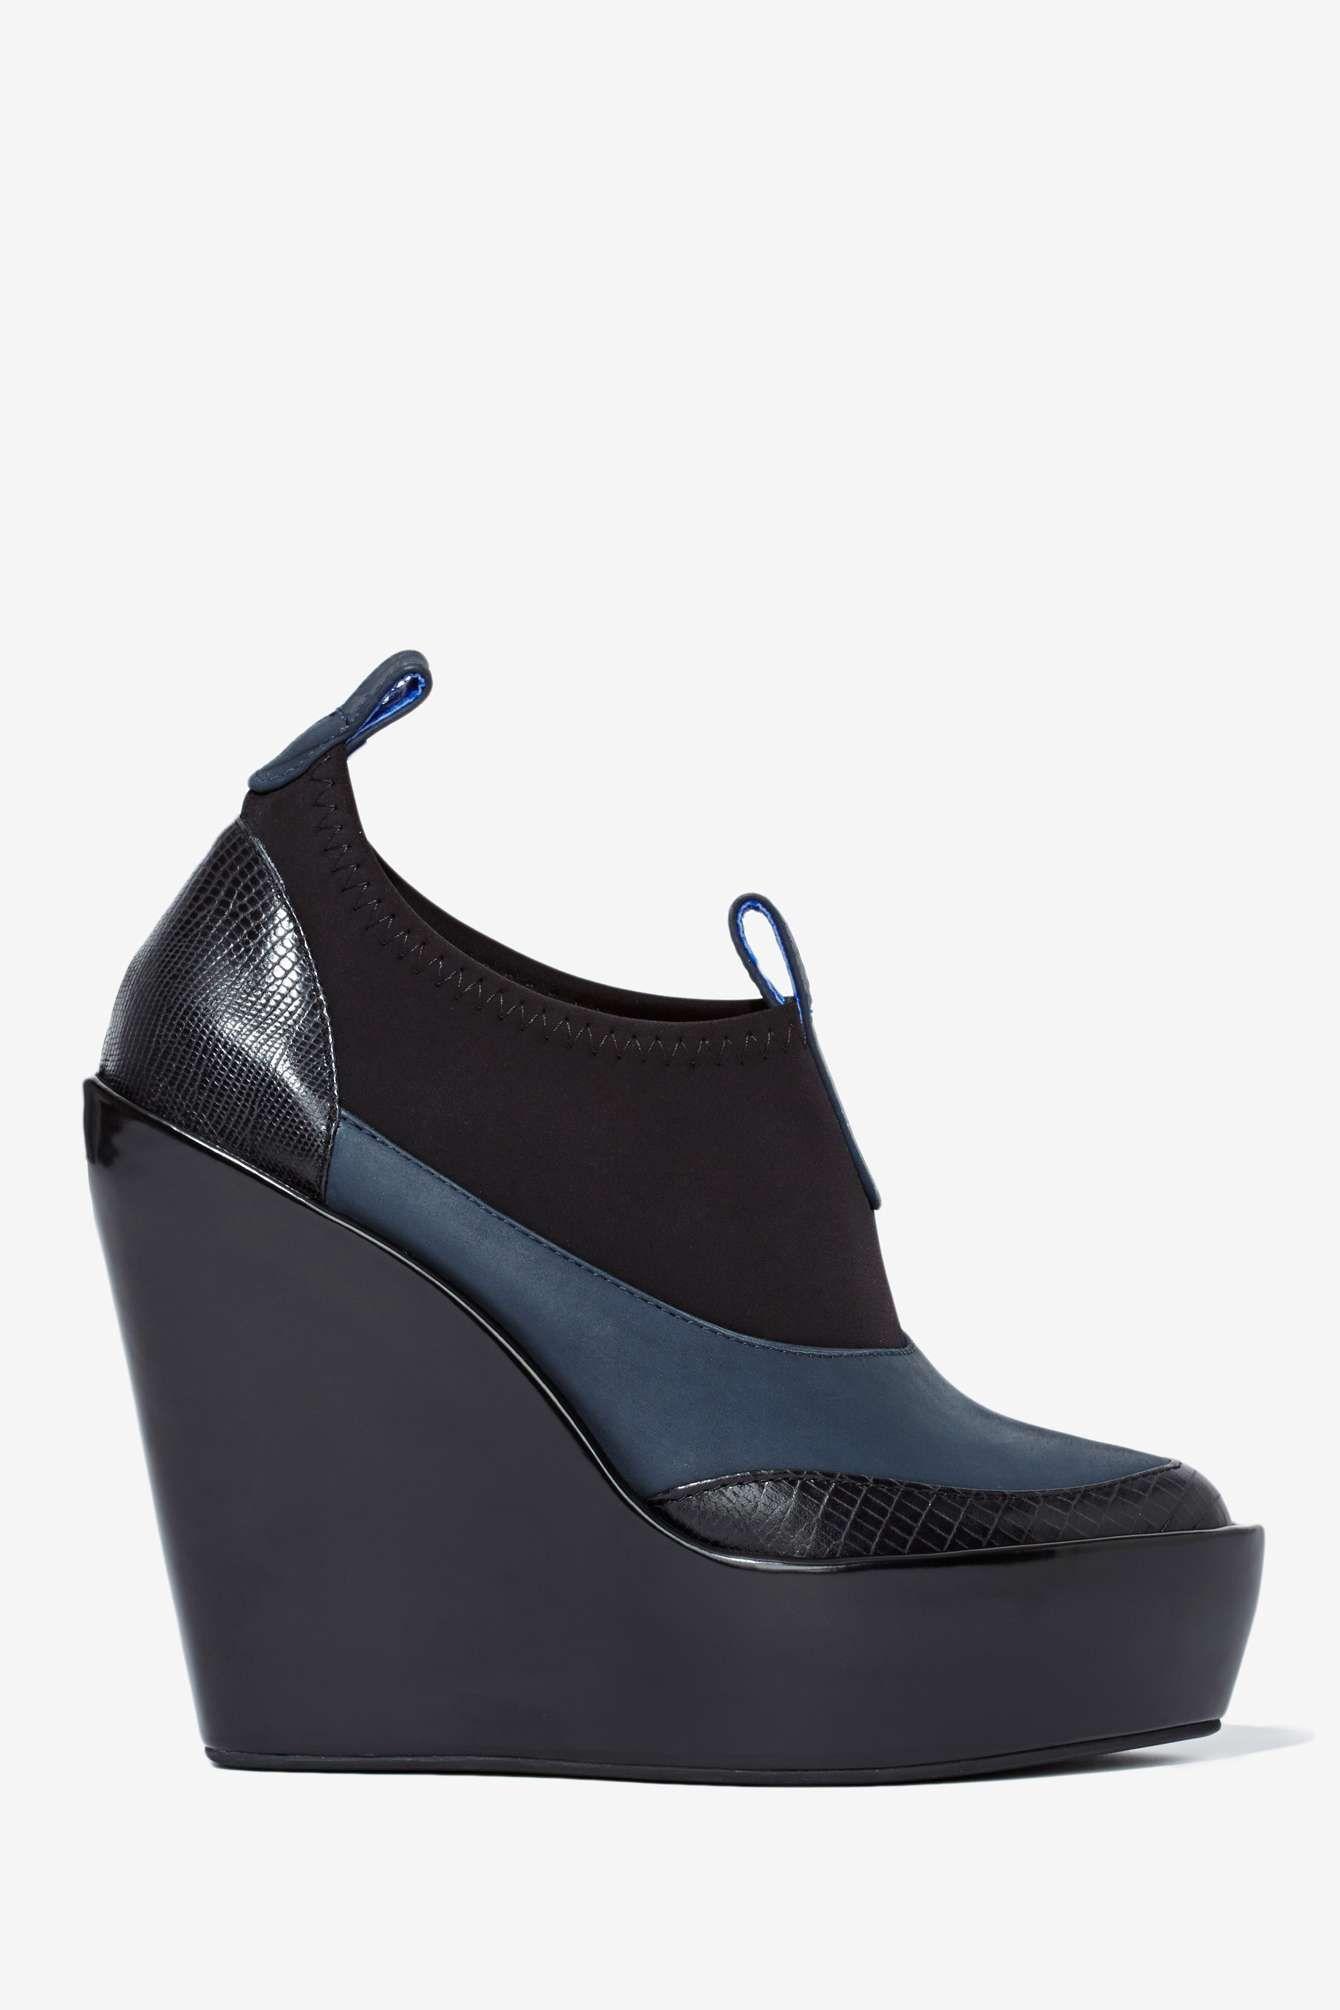 c244ea2f019b Jeffrey Campbell Soju Leather Wedge